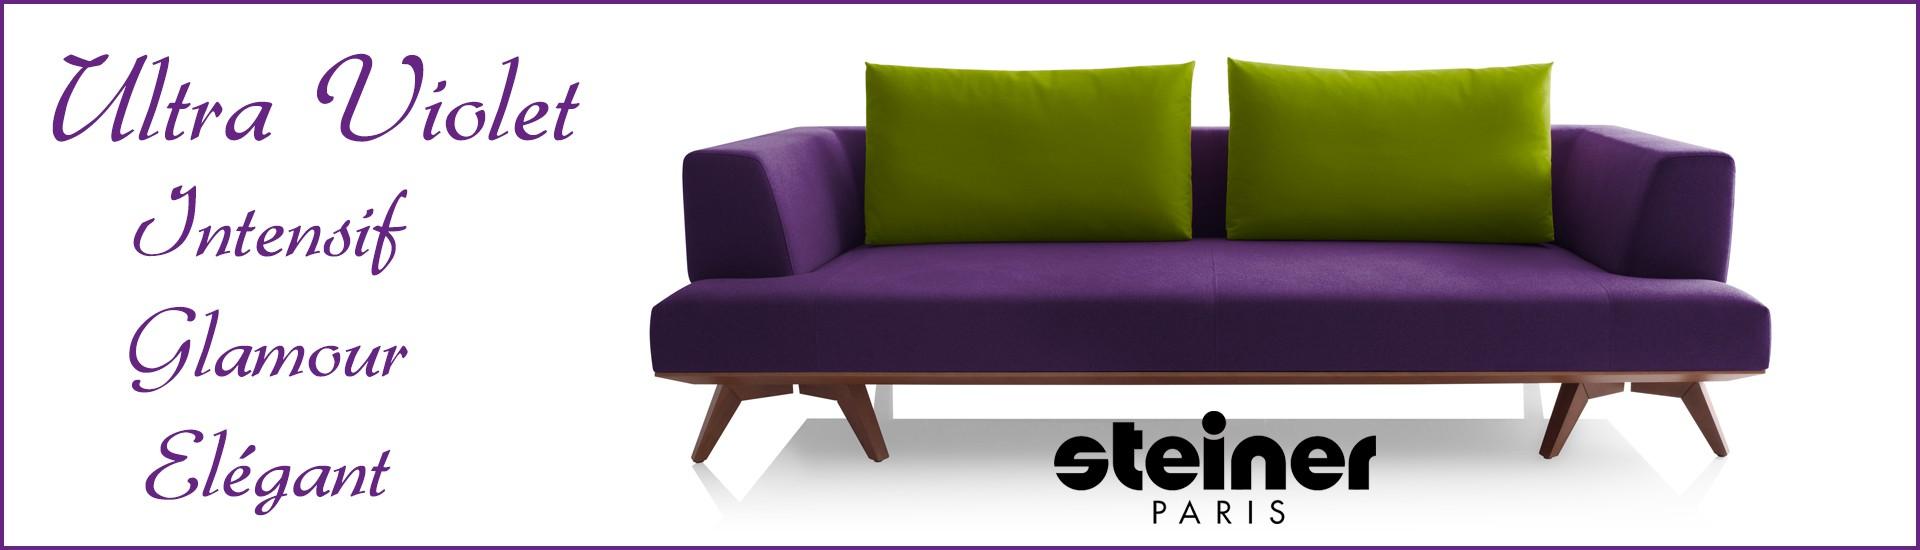 Steiner Paris Sequoia Ultra Violet Global meubles Clermont-Ferrand